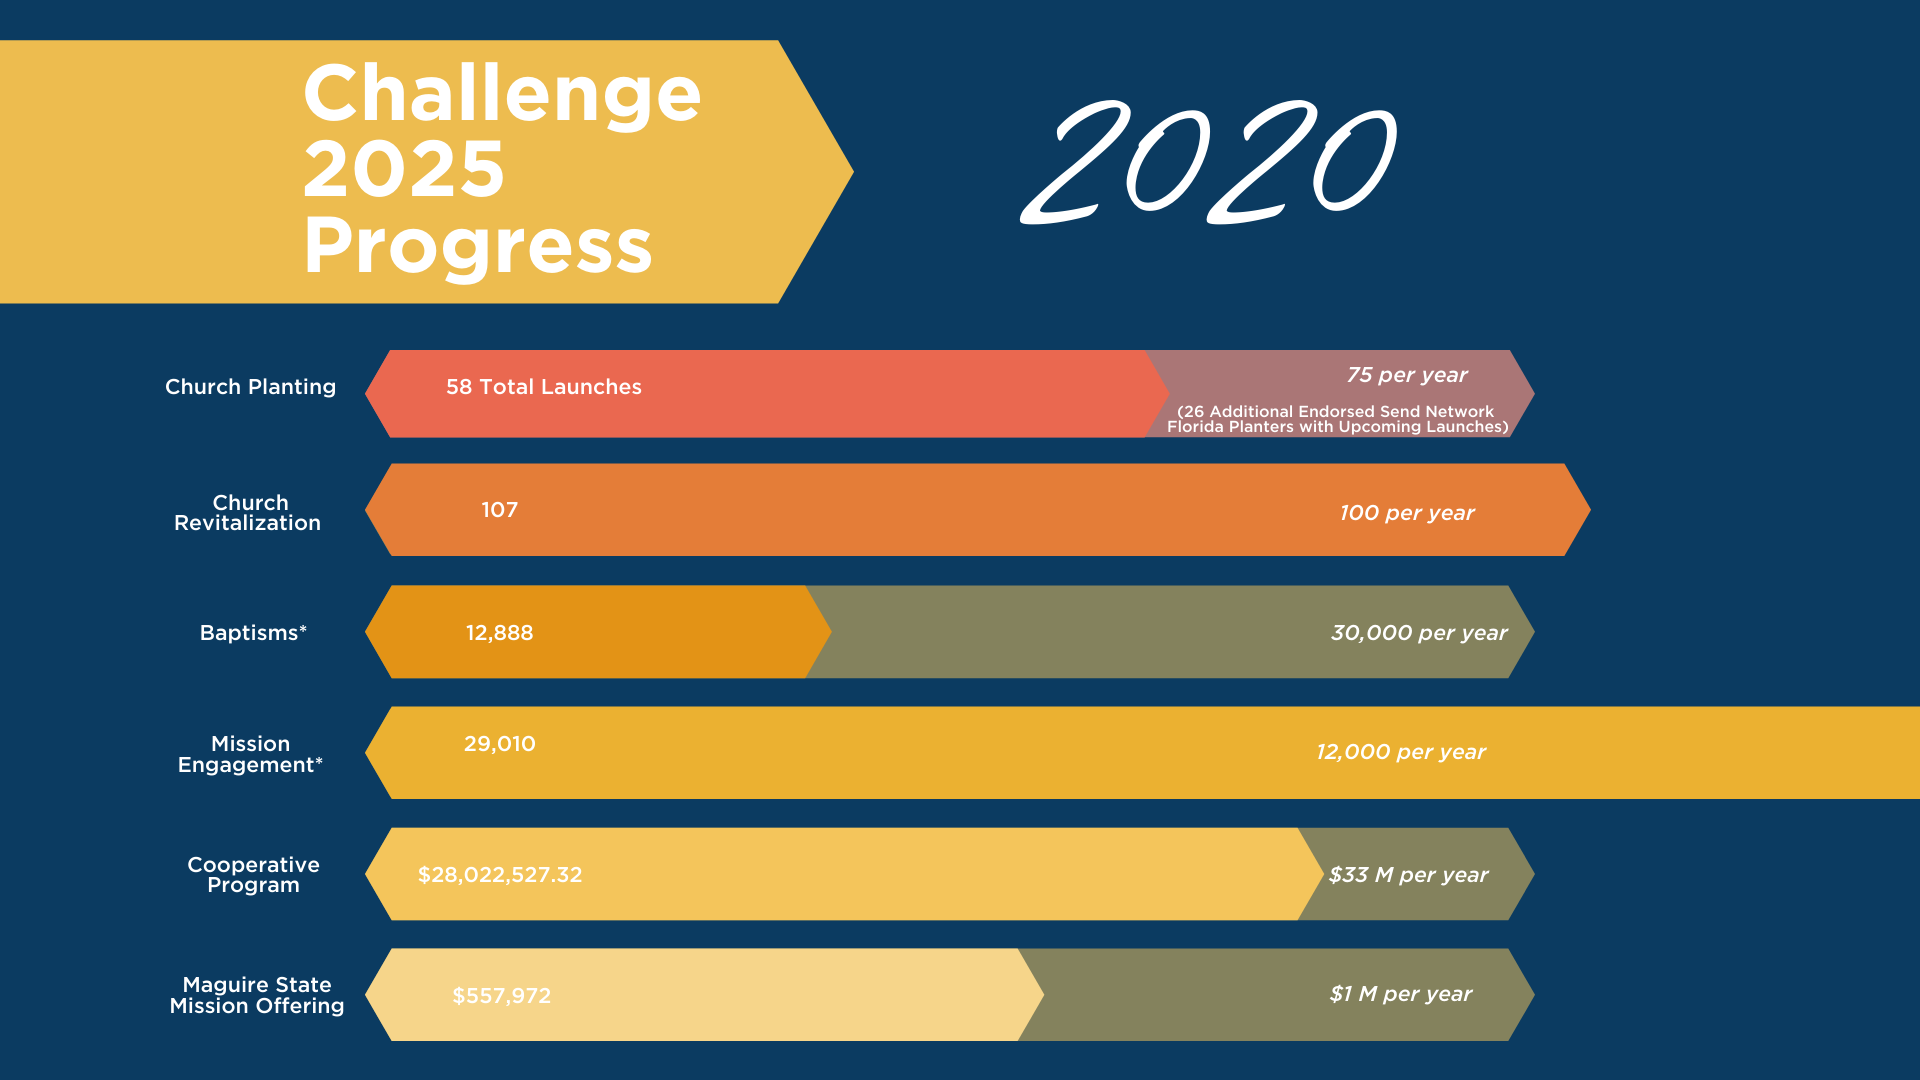 Challenge 2025 Process